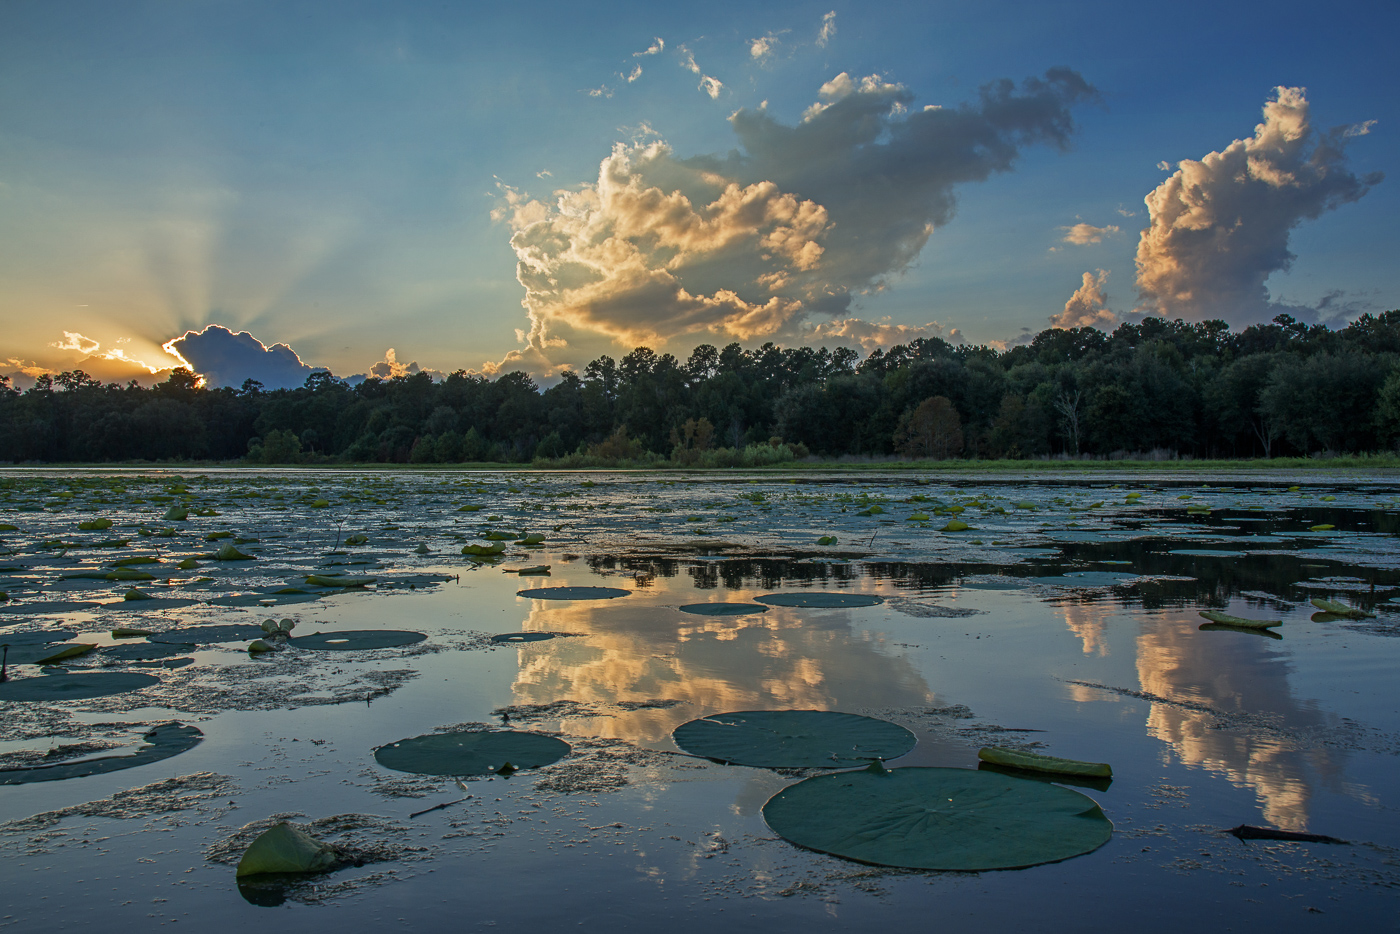 Drama on Tuscawilla Lake